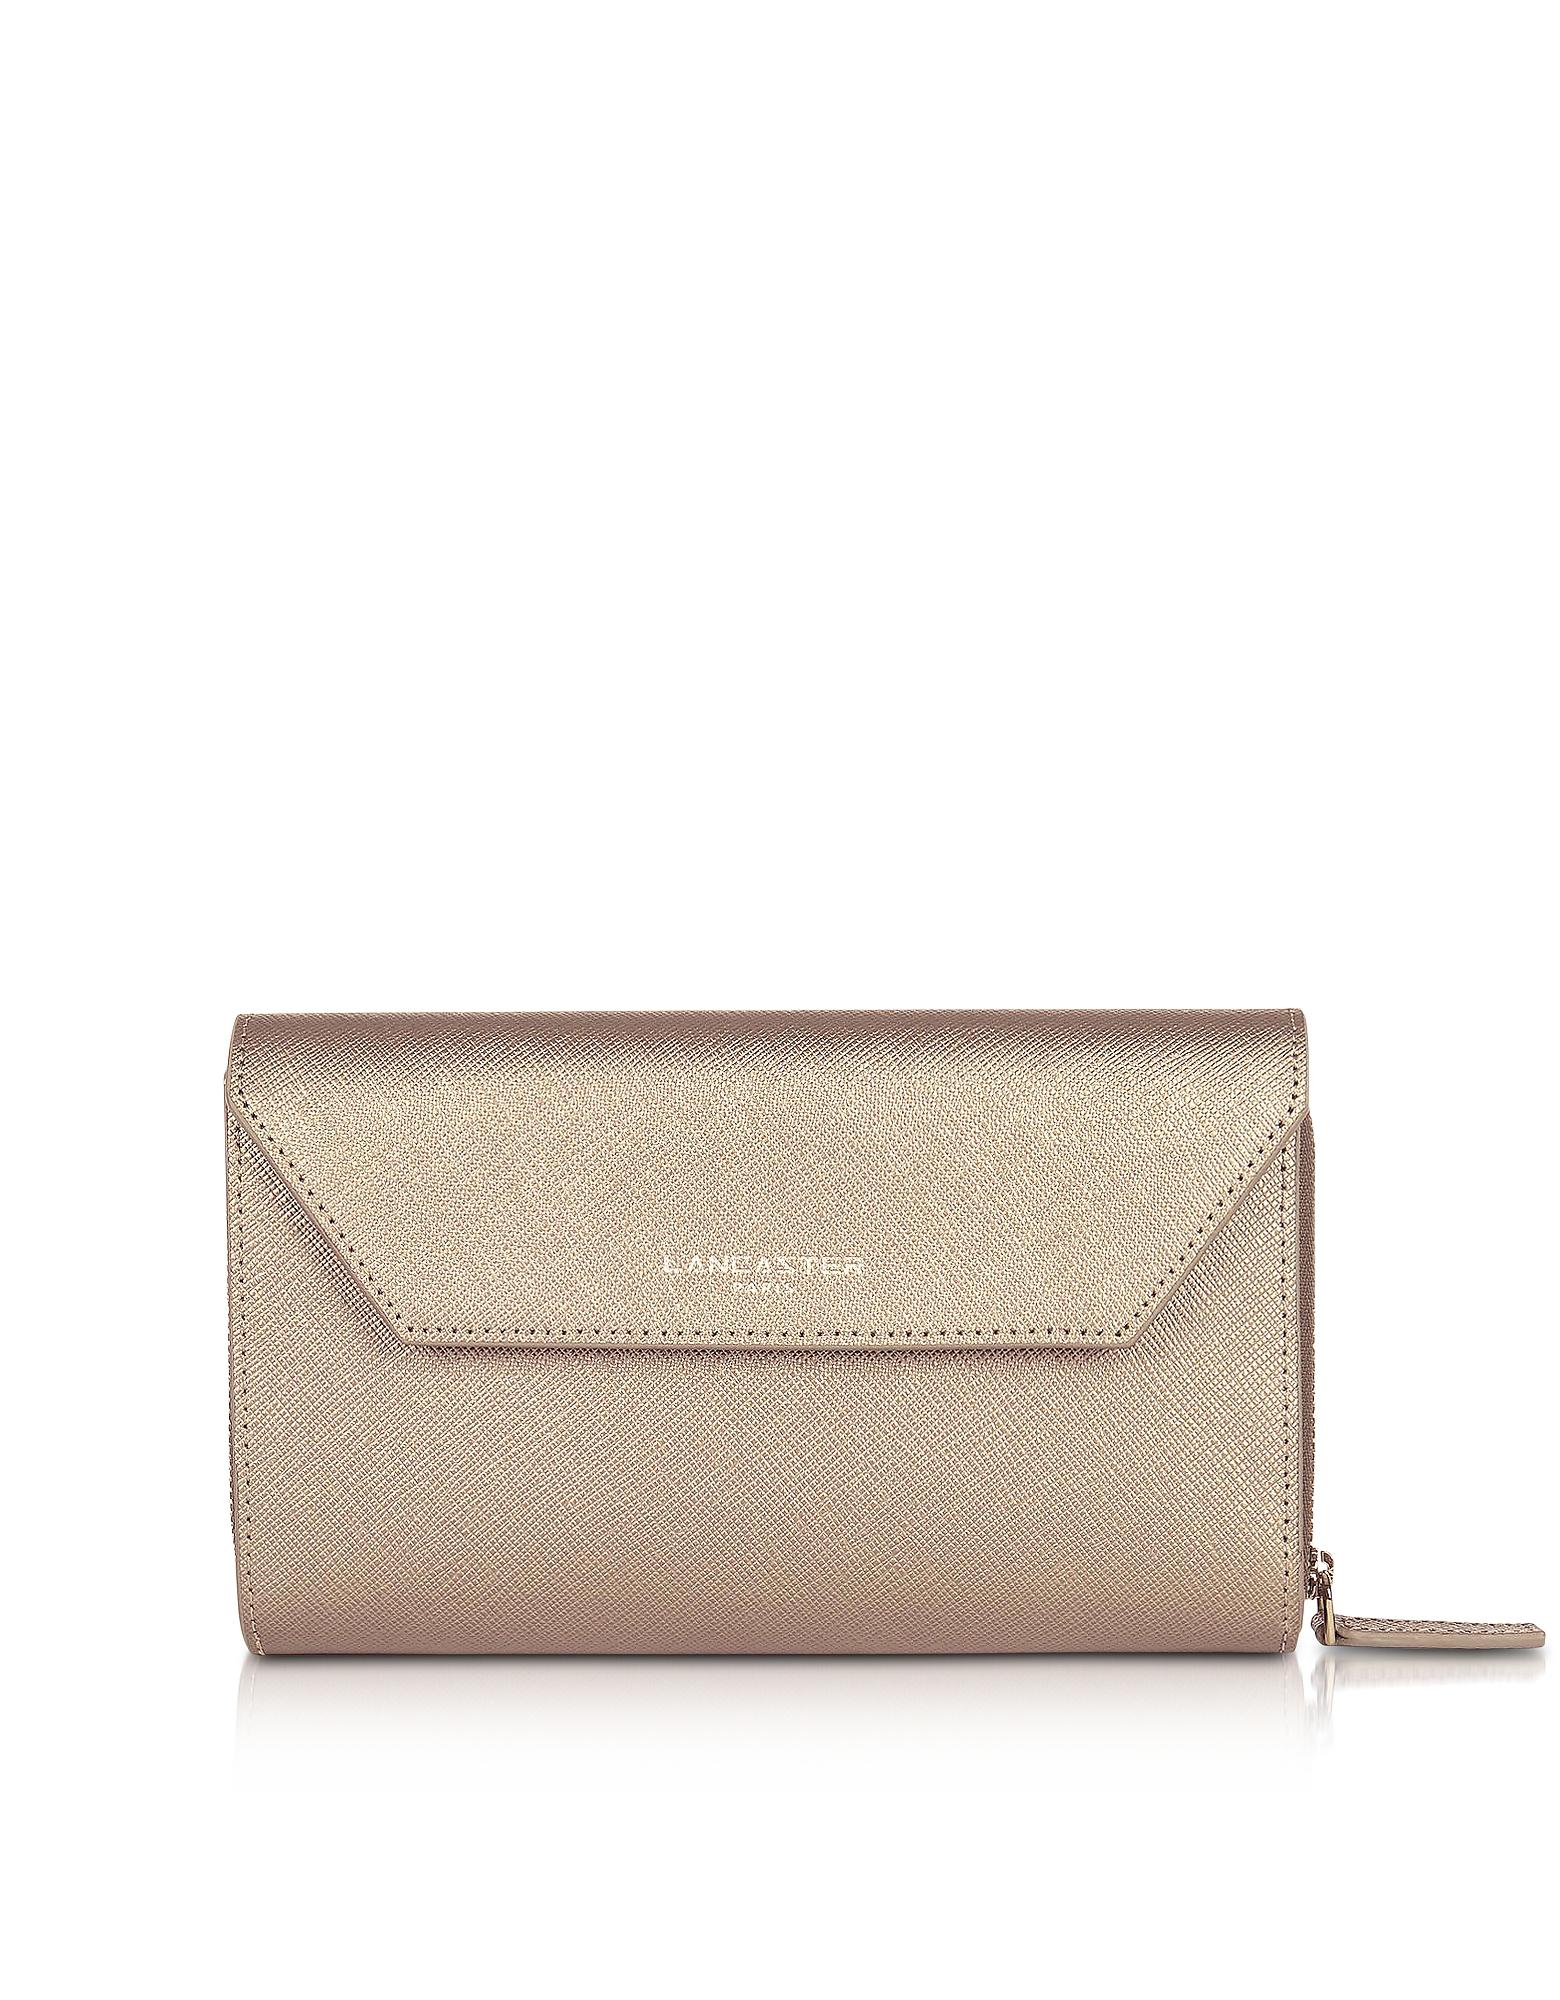 Lancaster Paris Handbags, Adele Leather Continental Wallet